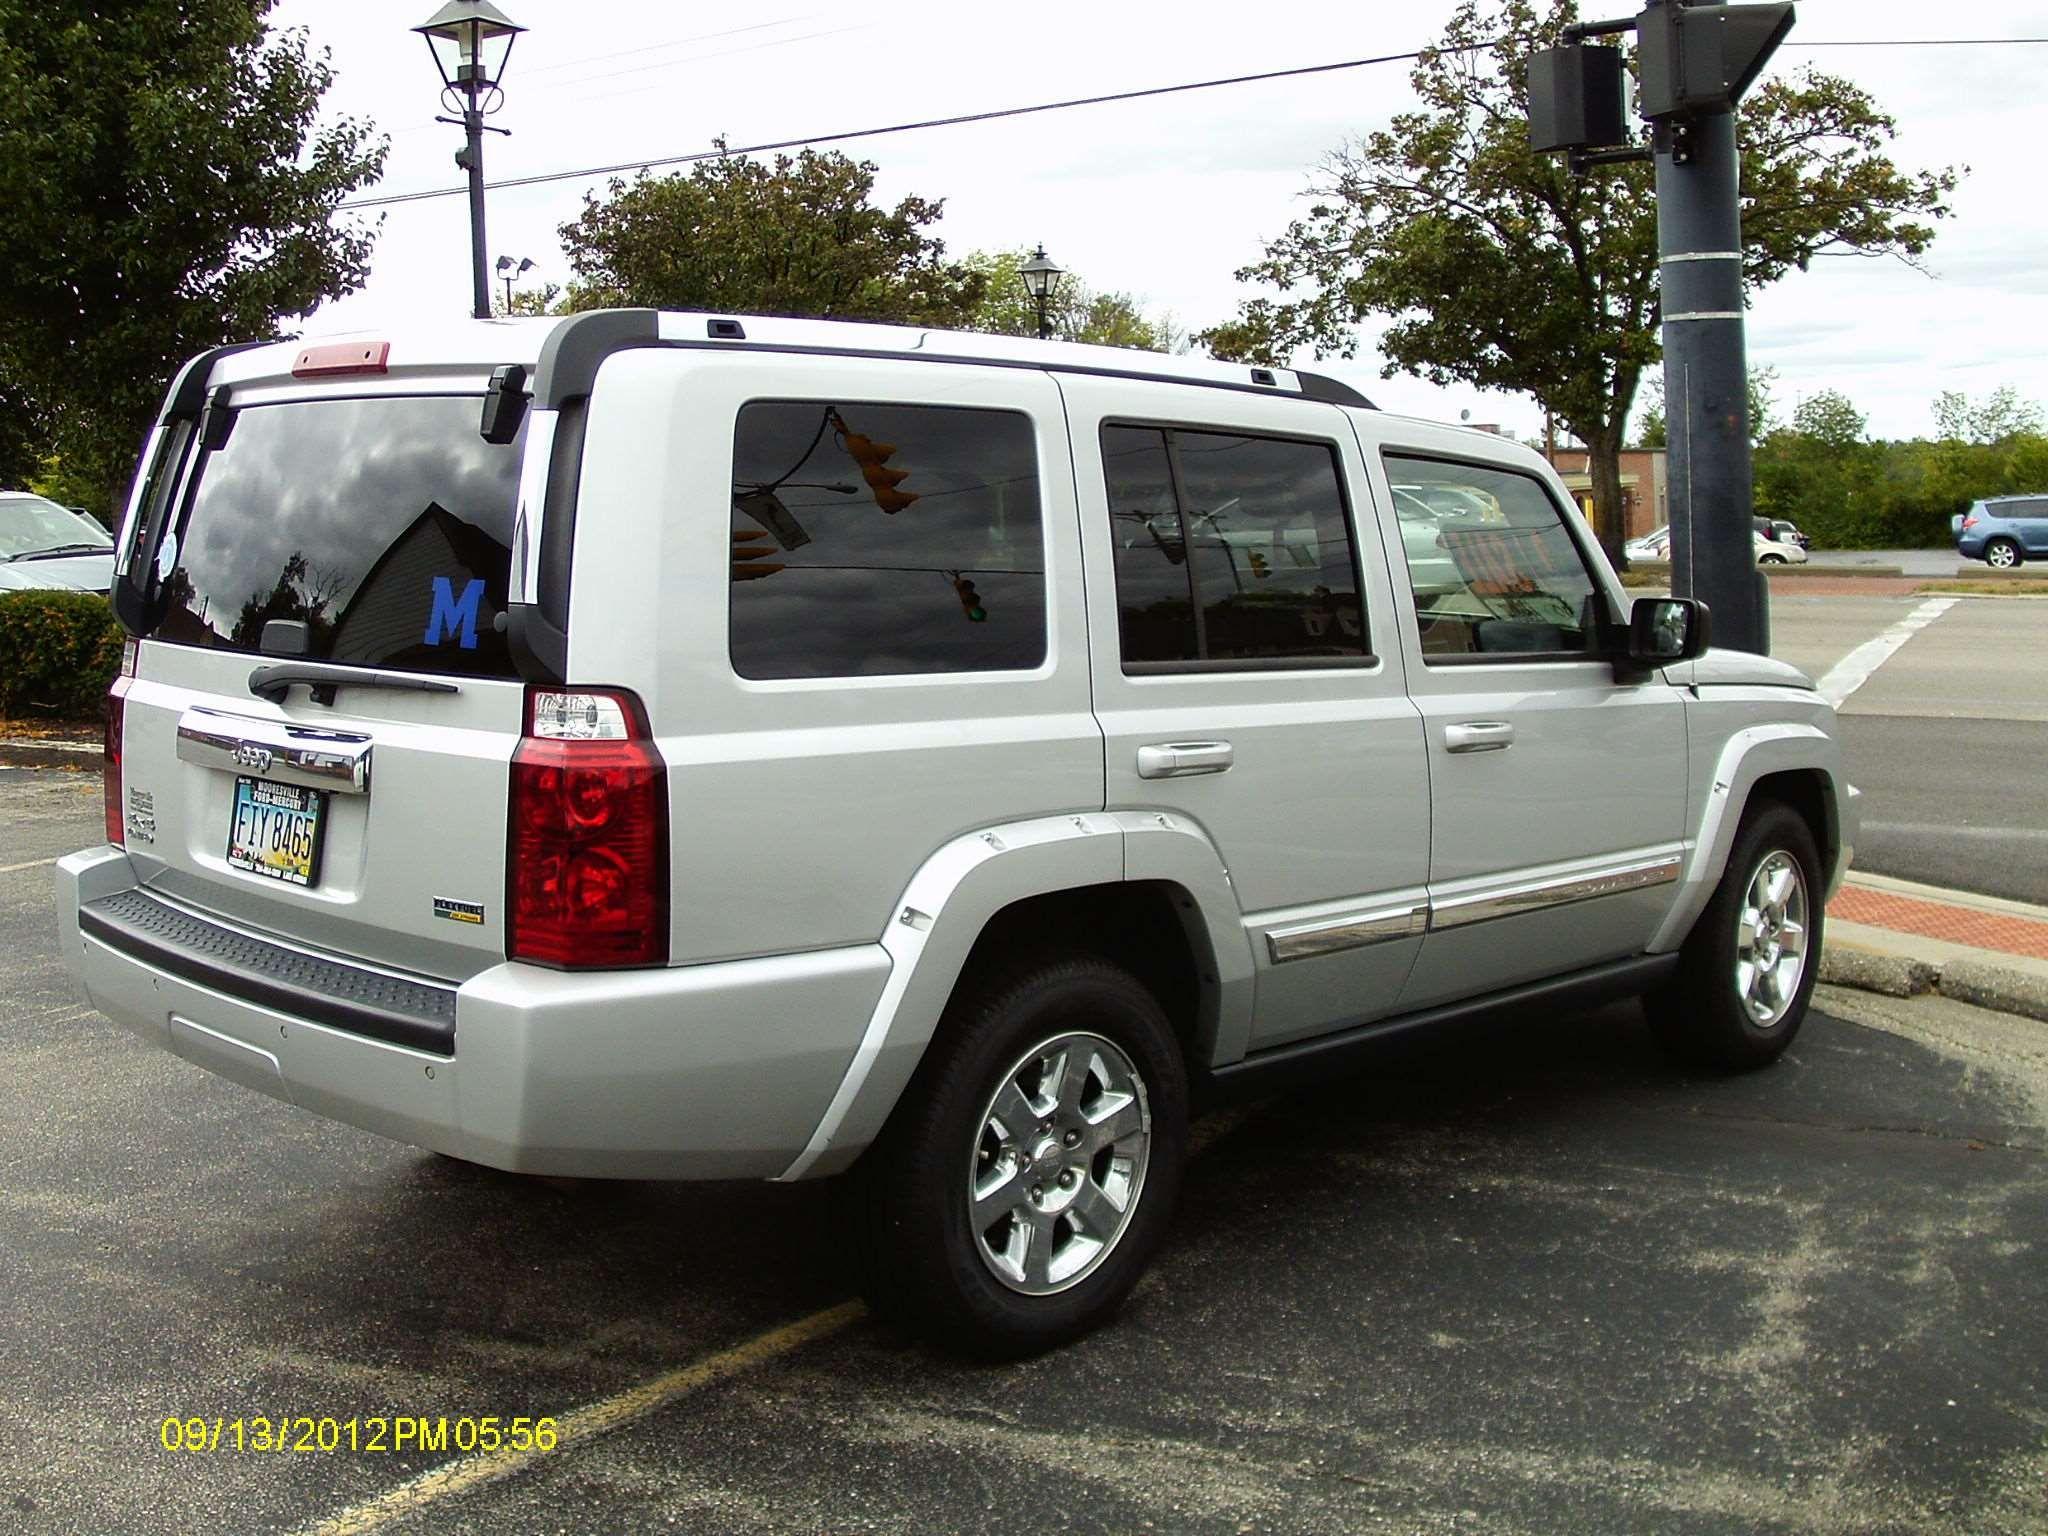 make: jeep model: commander year: 2007 exterior color: silver